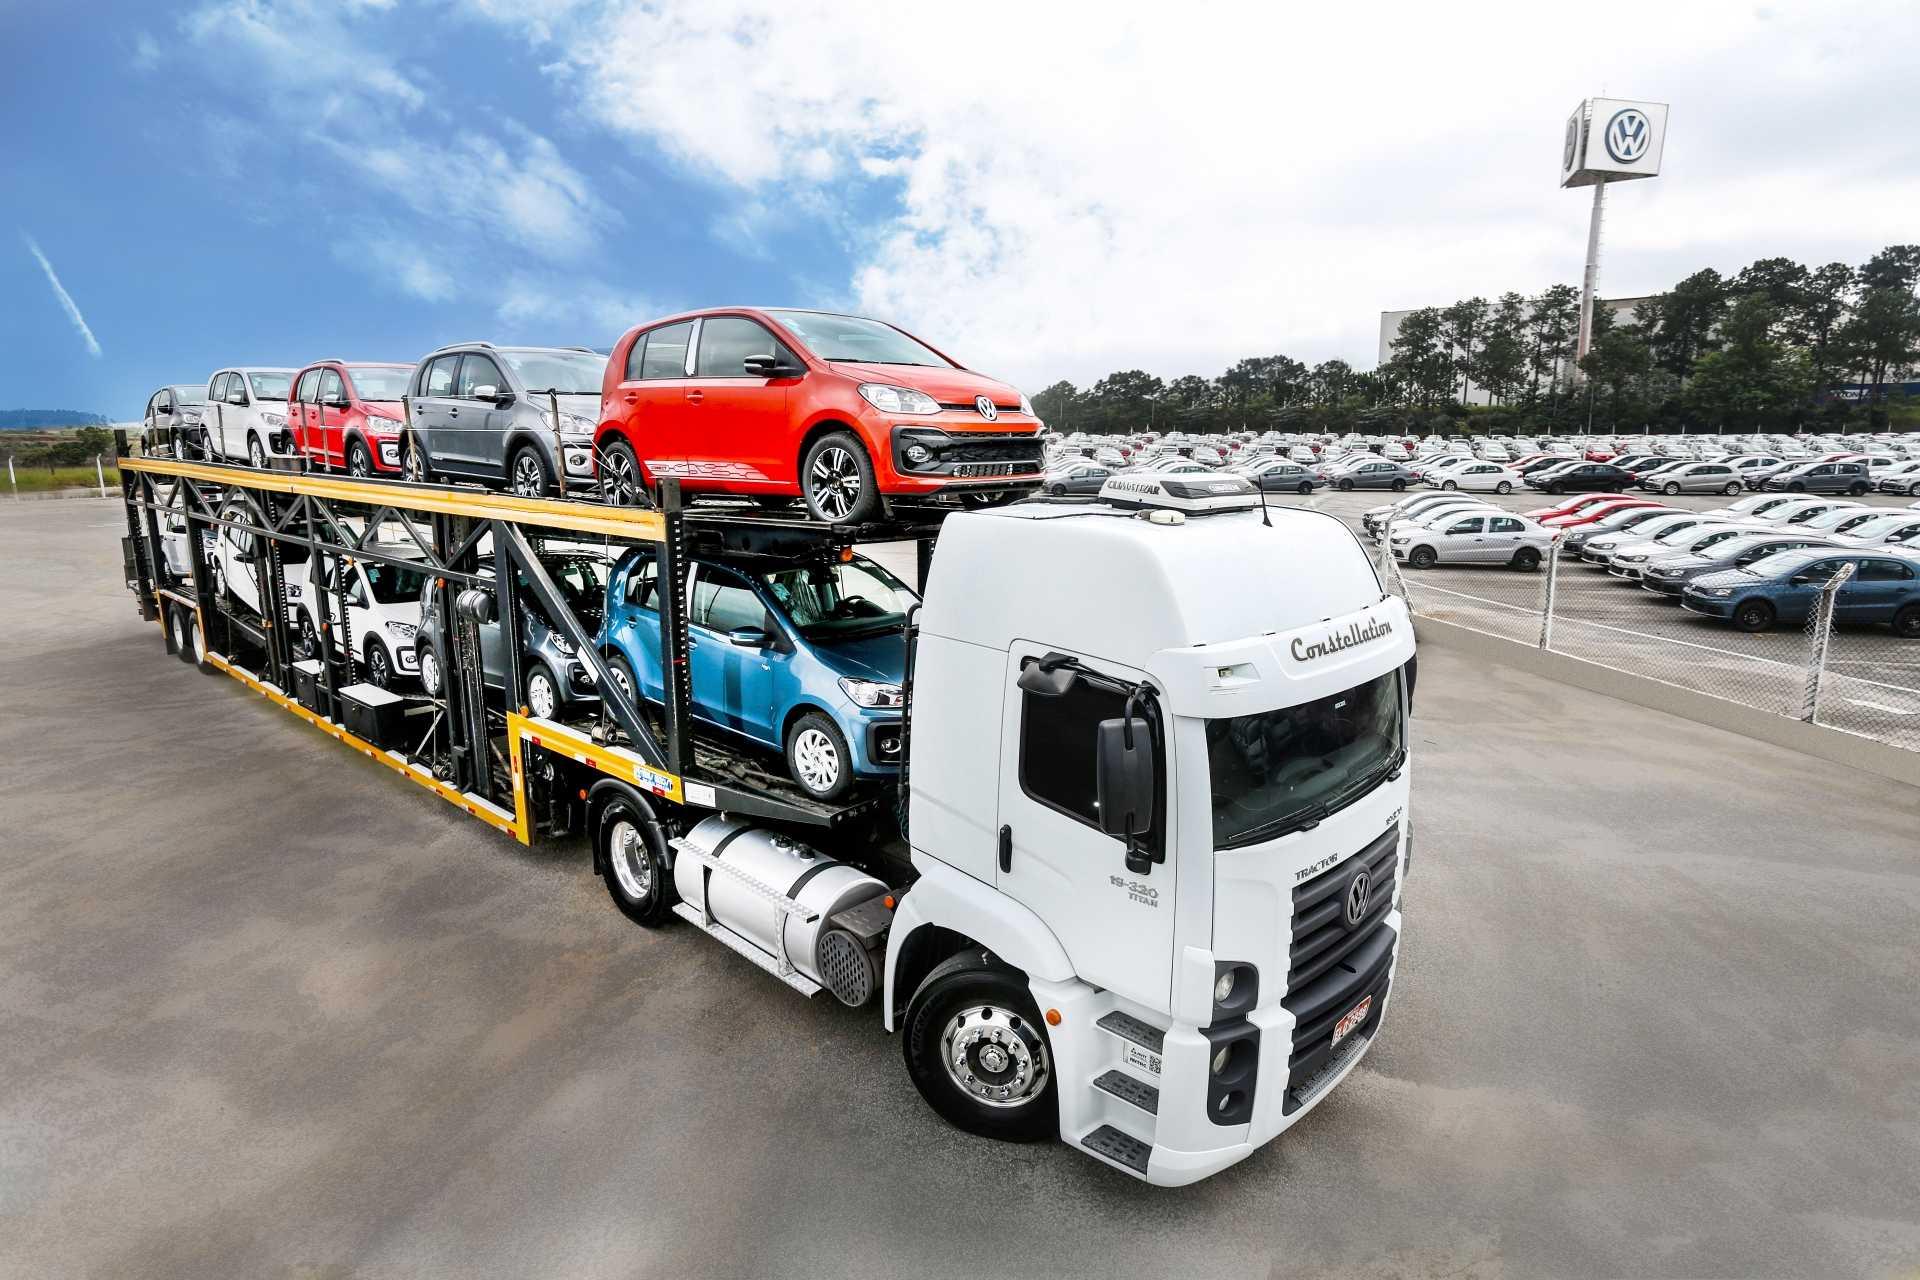 Volkswagen se mantém liderança de exportações de carros, crescendo 52% no 1º semestre de 2017